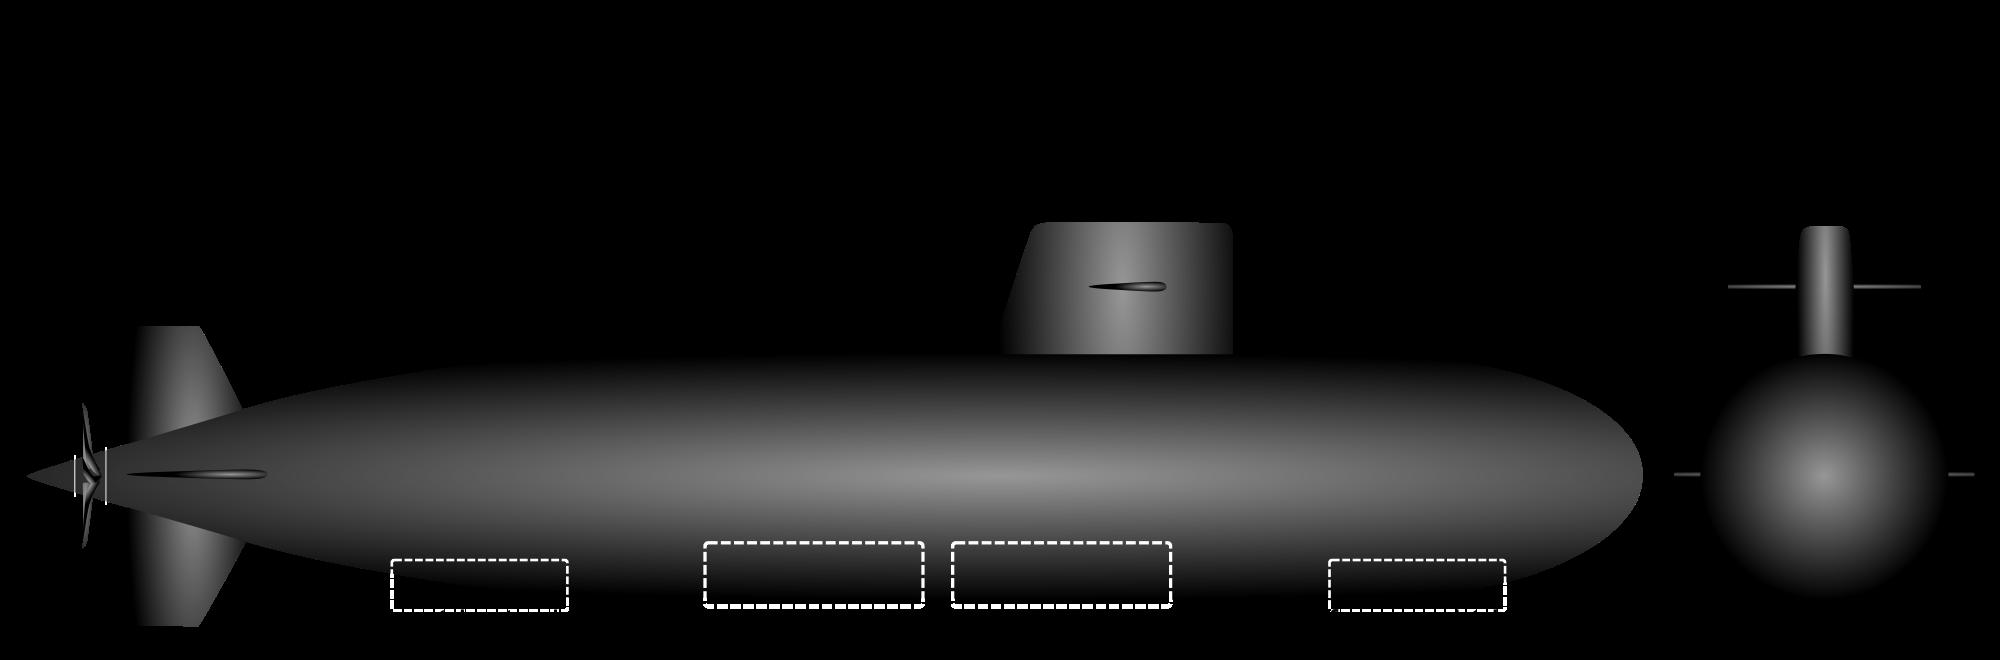 jpg transparent library submarine vector kapal selam #115973876